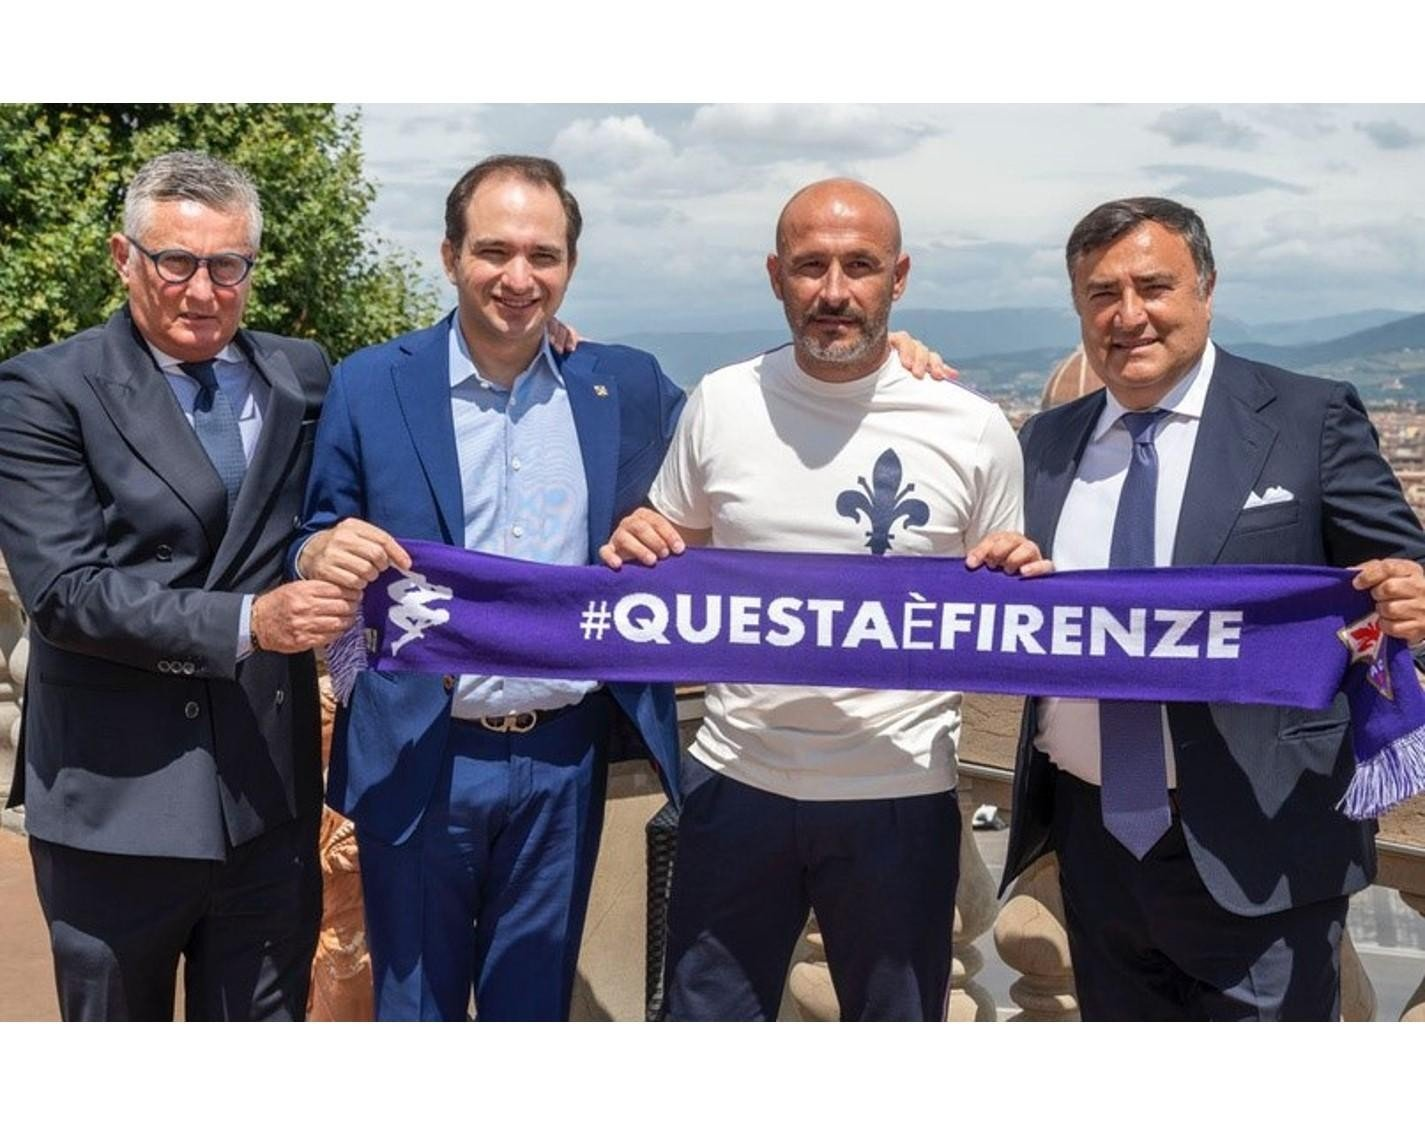 ITALIANO UNVEILED AS NEW FIORENTINA COACH